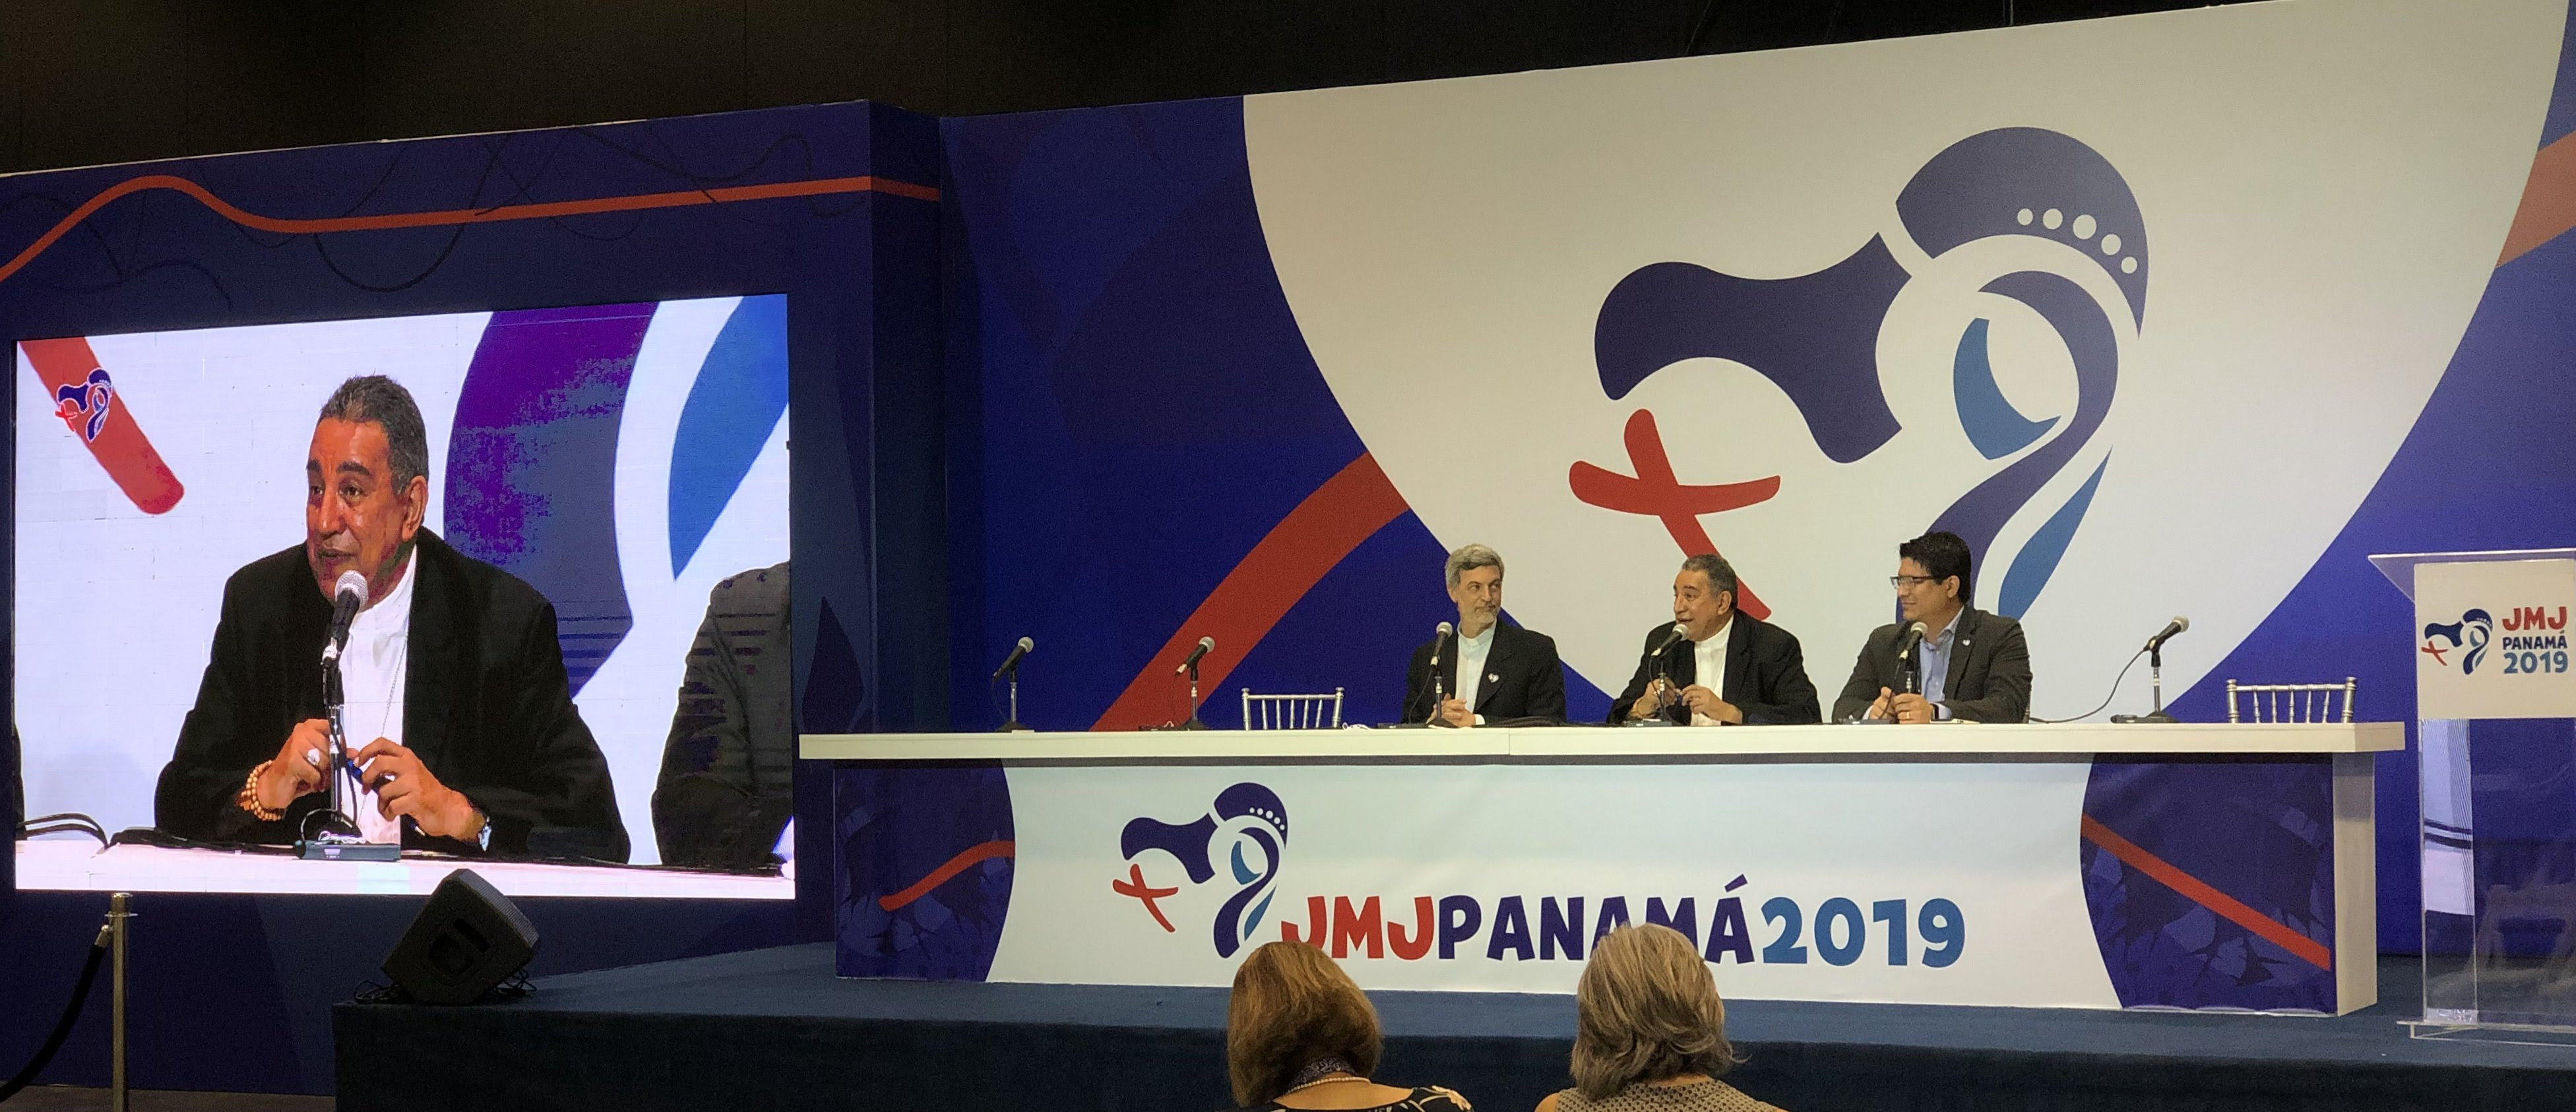 P. Alexandre Awi, Mons. Ulloa y Víctor Chang © JMJ Panamá 2019